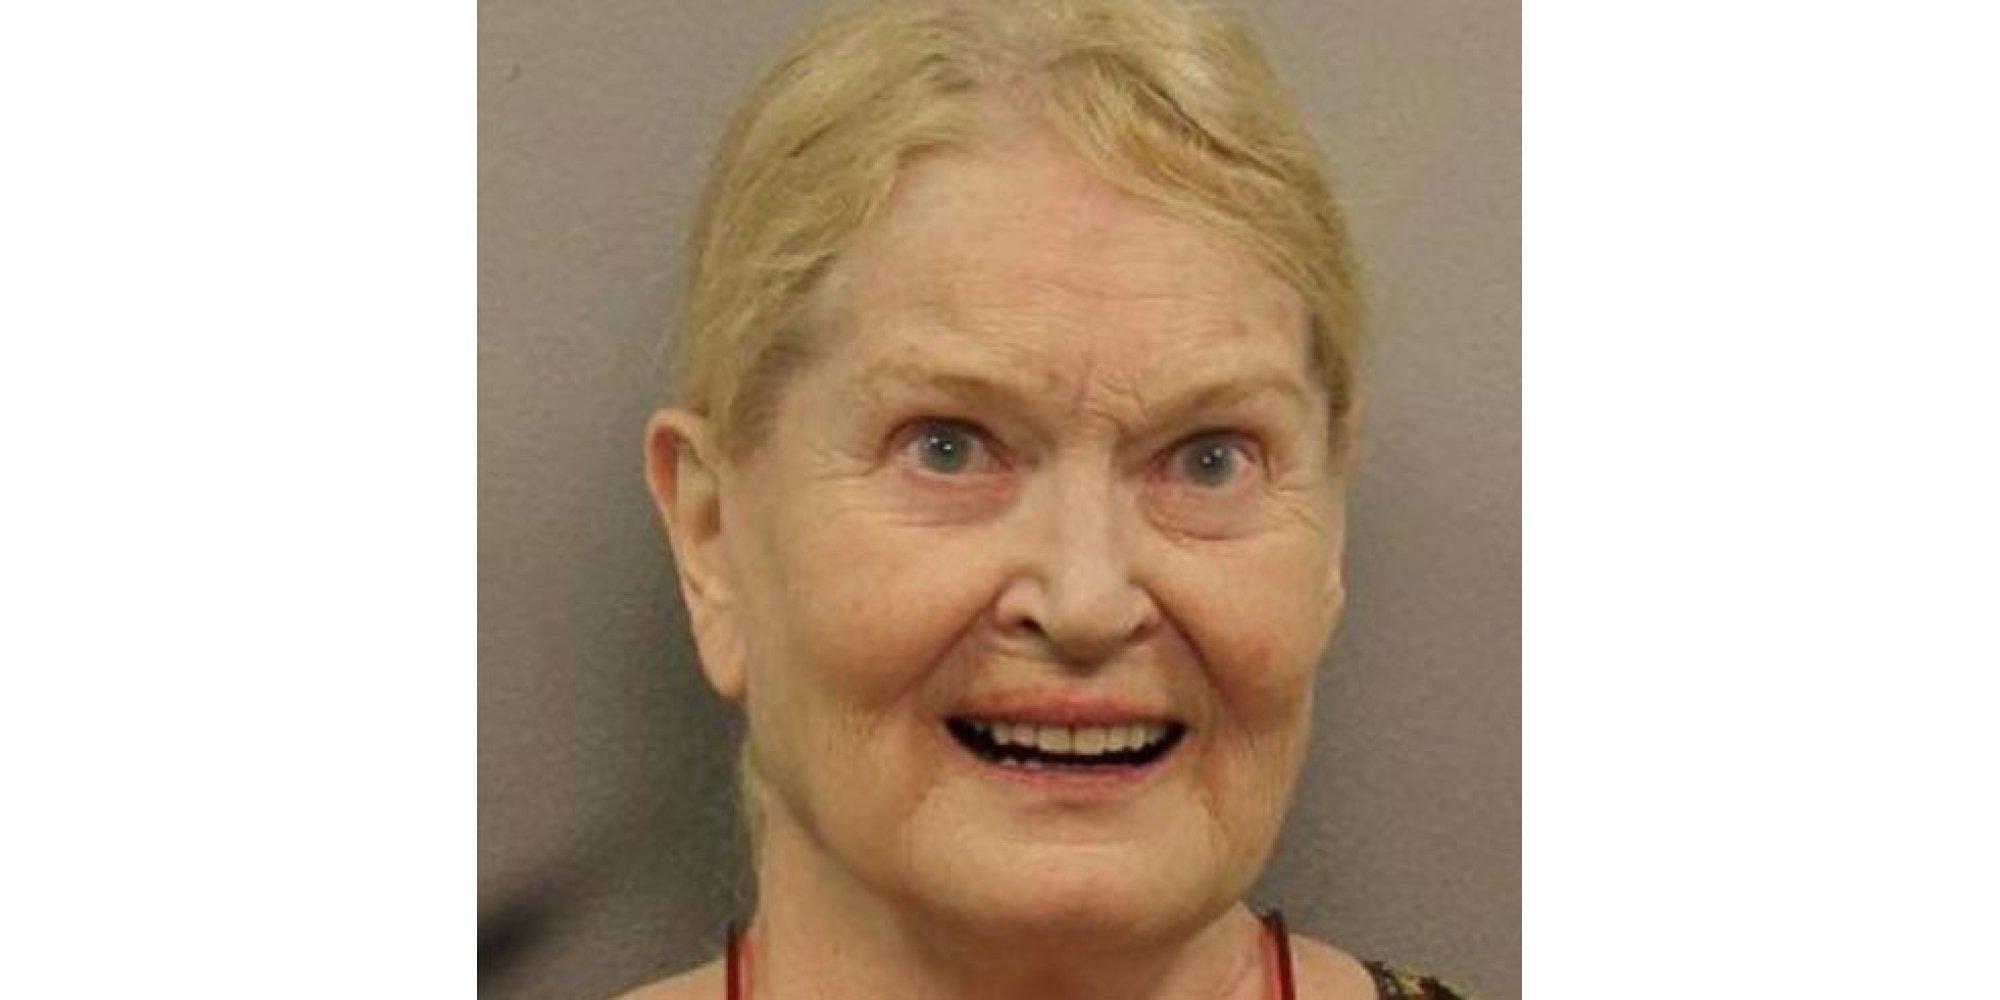 Ikki Twins,Mary Wimbush Sex videos Cele Abba (1906?992),Lucy Boynton (born 1994 (born in the United States